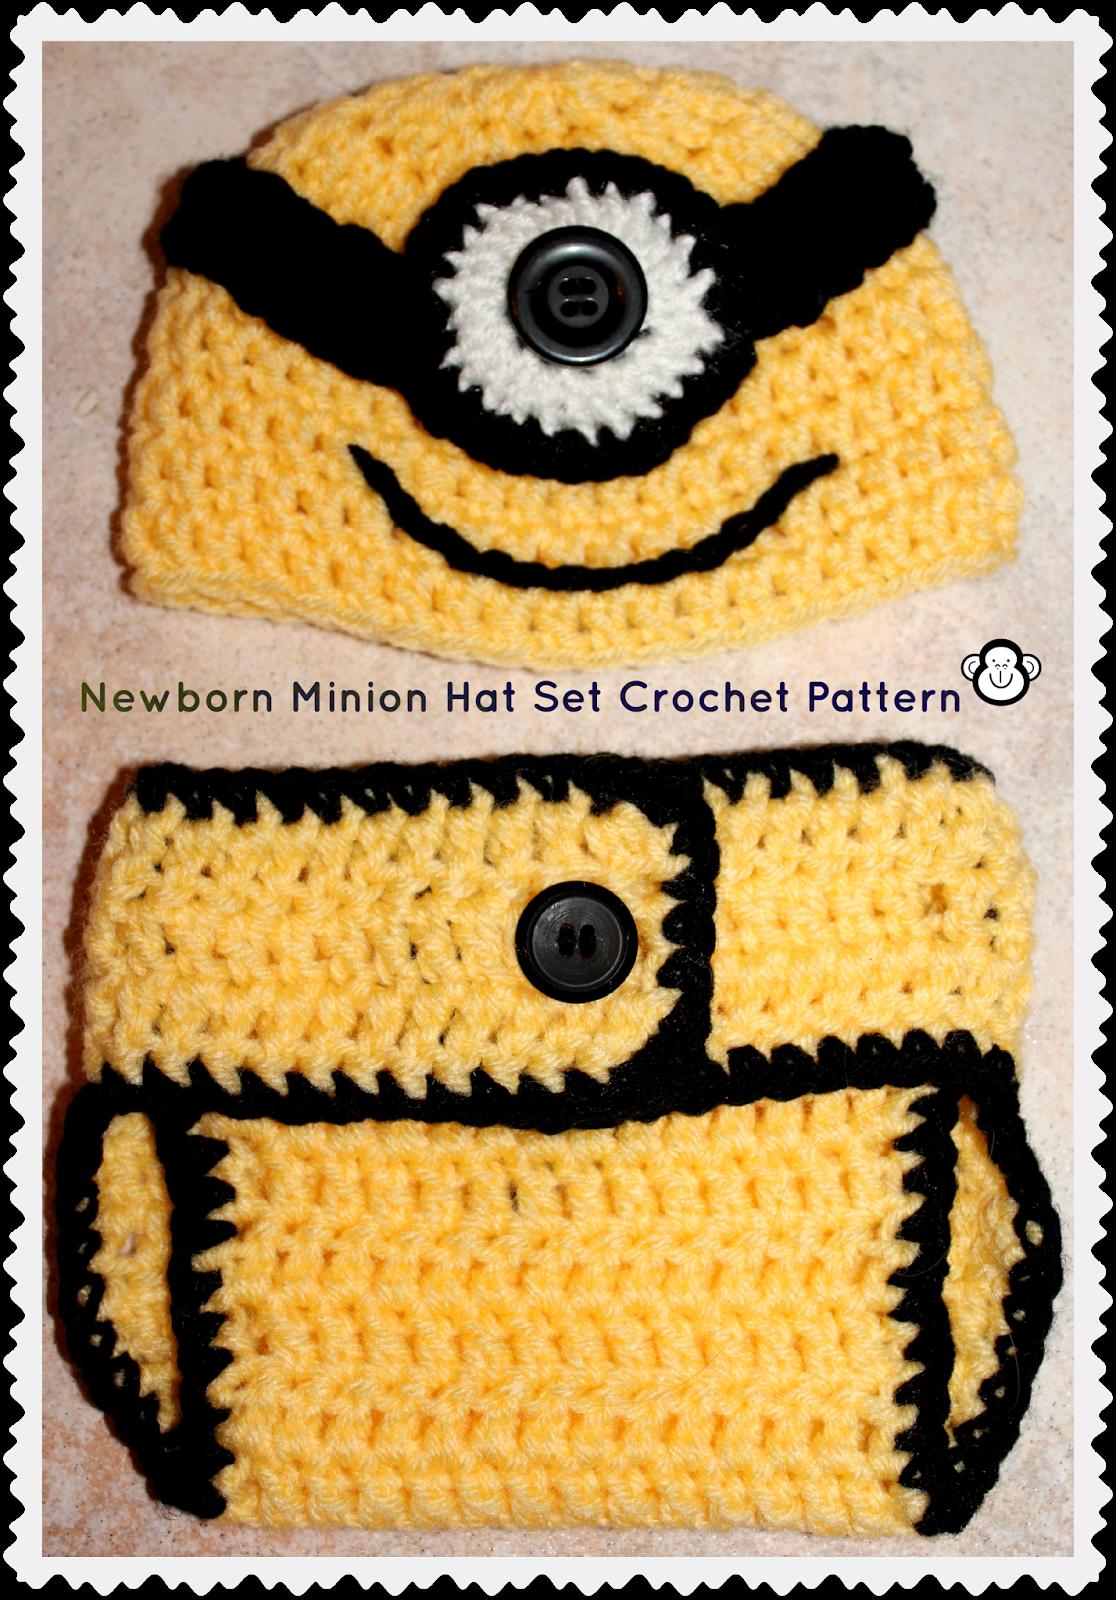 Único Despicable Me Minion Patrón De Crochet Sombrero Cresta - Manta ...